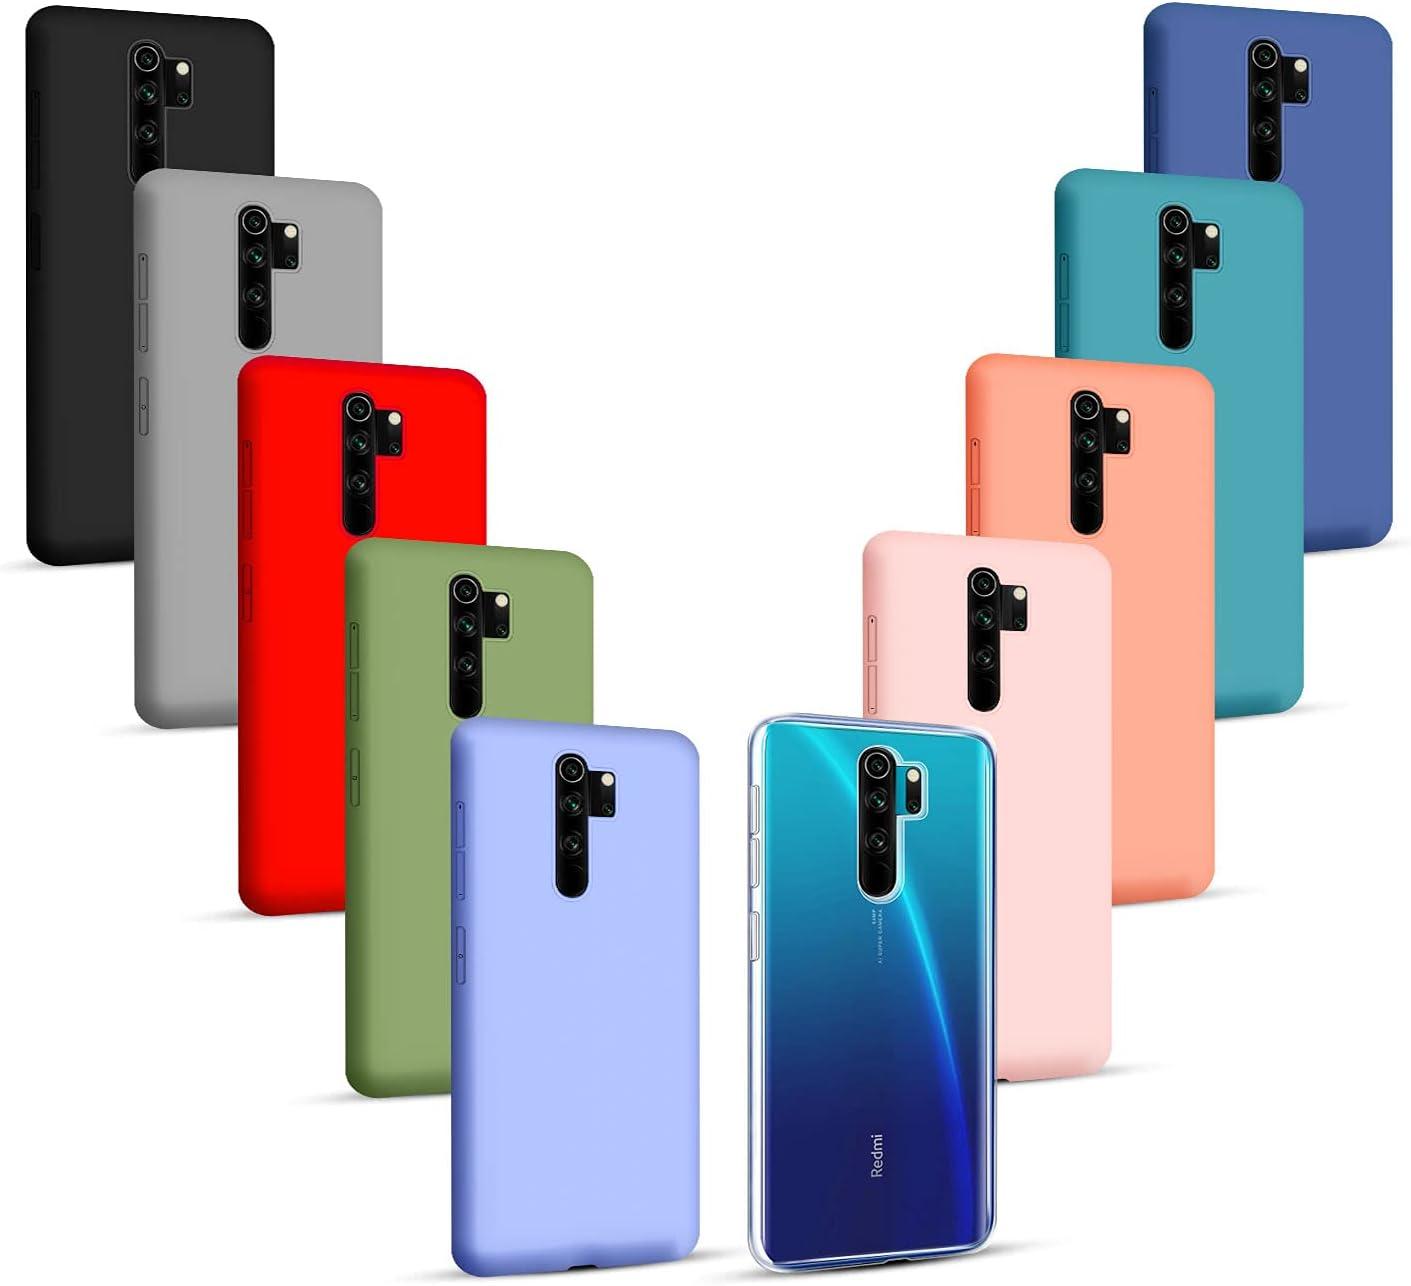 Iuveruln 10X Funda Compatible Xiaomi Redmi Note 8 Pro, Ultra Delgado Color Sólido Silicona Carcasa, Anti-Rasguños Anti-Choque, TPU Flexible Cover, Transparente + 9 Colores